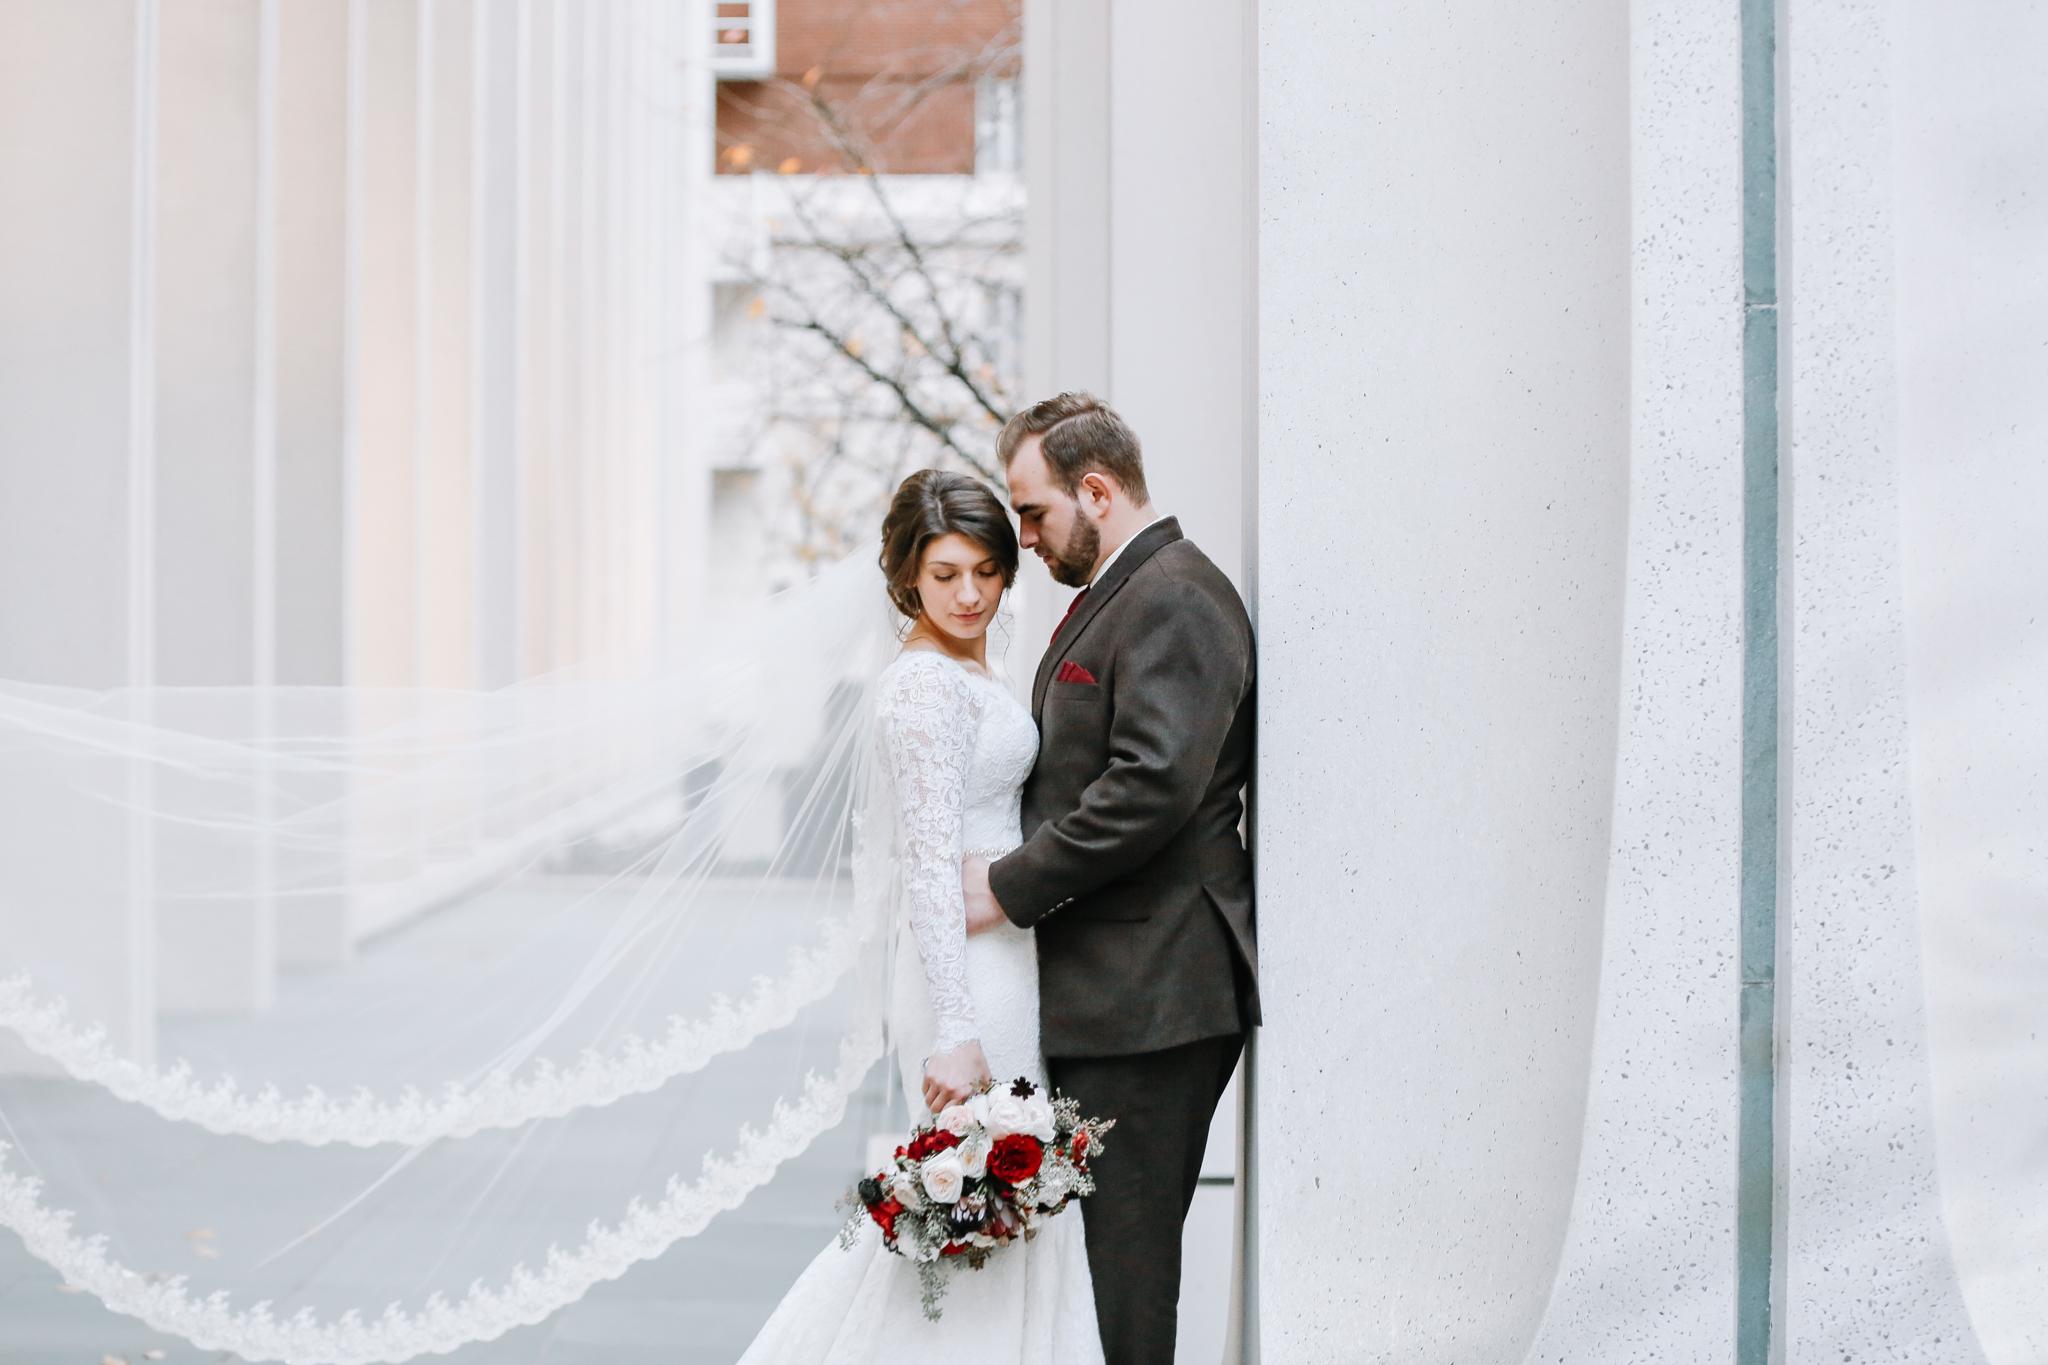 Manu and Laura - Portland Wedding Photographer - 84.jpg